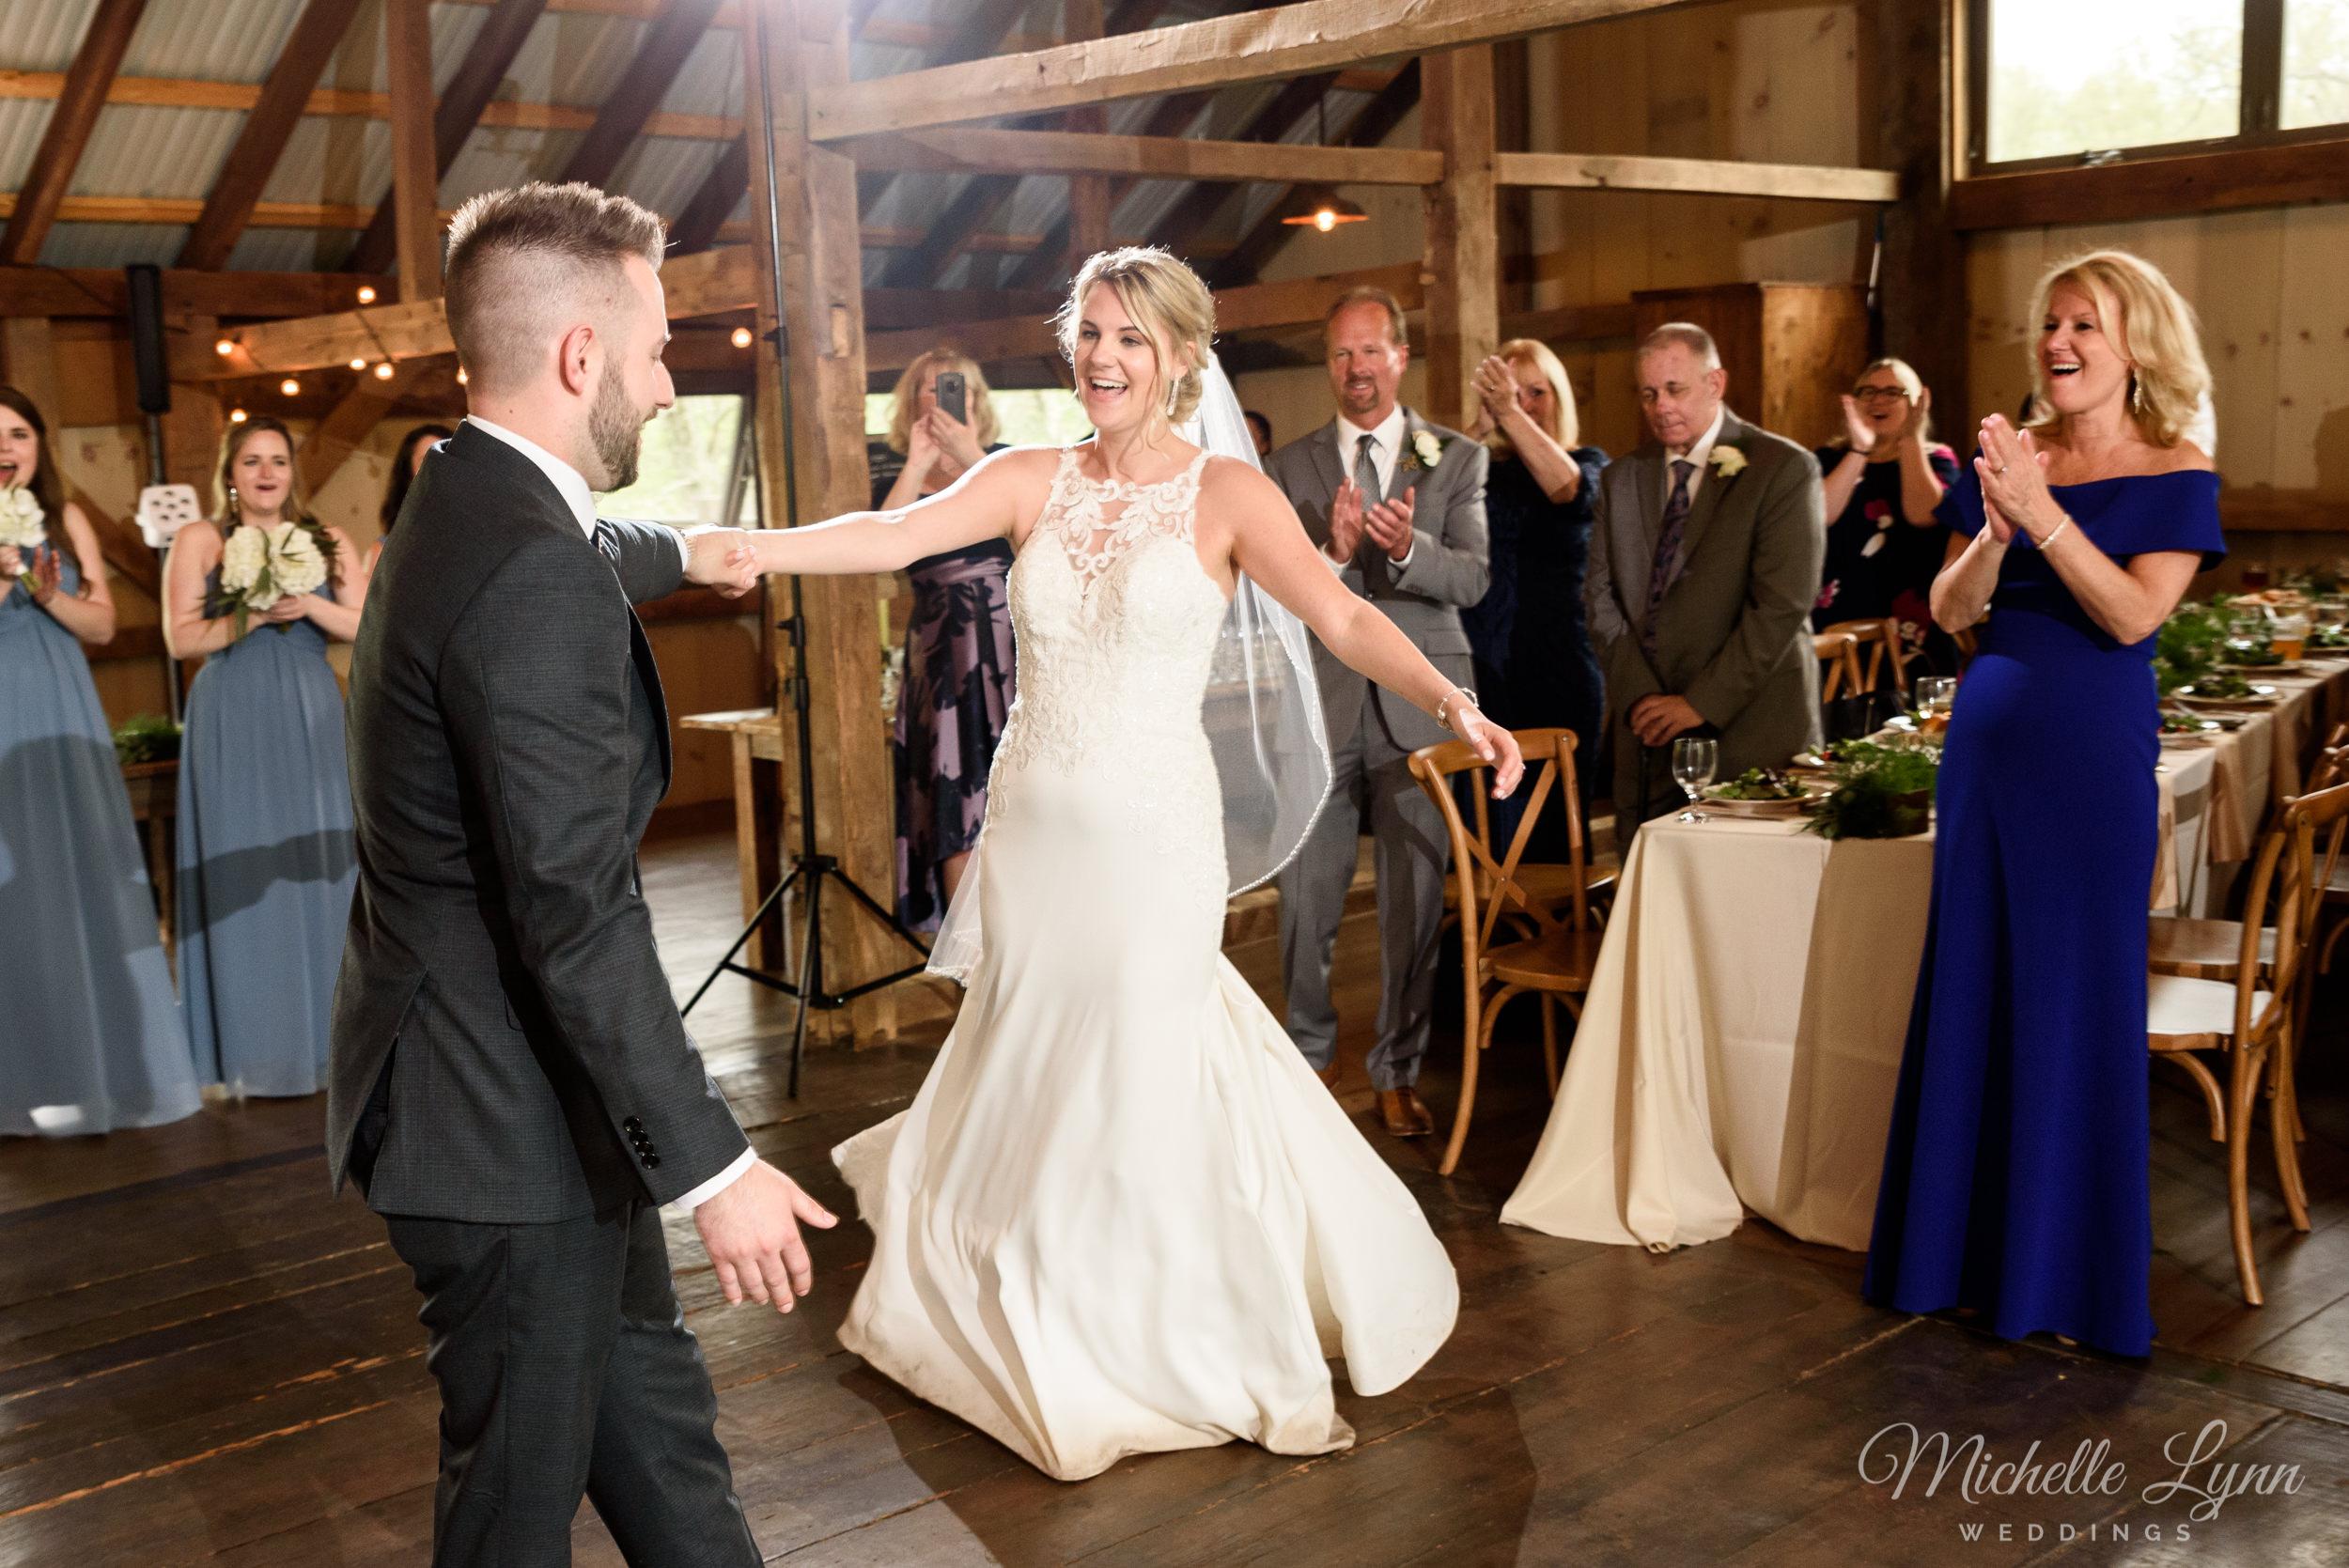 mlw-the-farm-bakery-and-events-wedding-photos-64.jpg